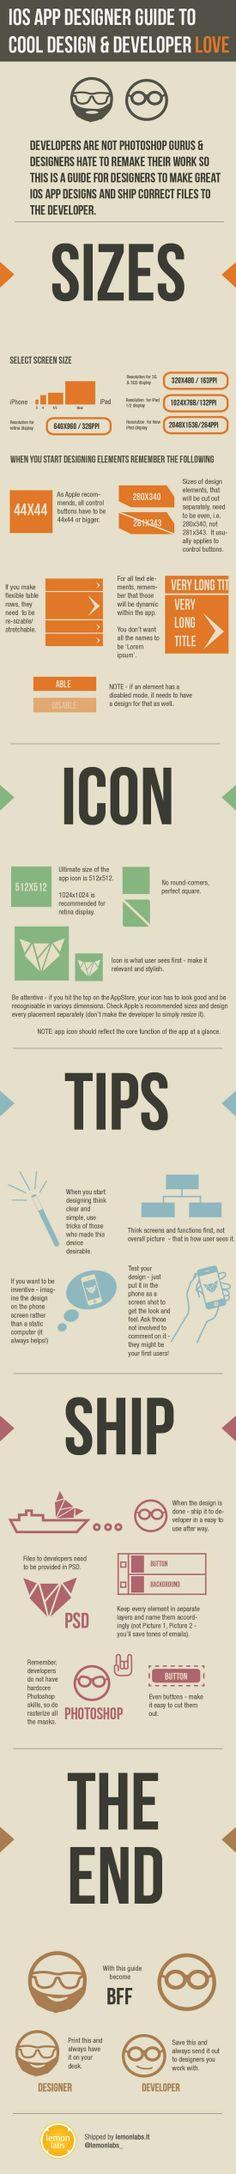 94 best Info + Graphic images on Pinterest Info graphics - resume maker app